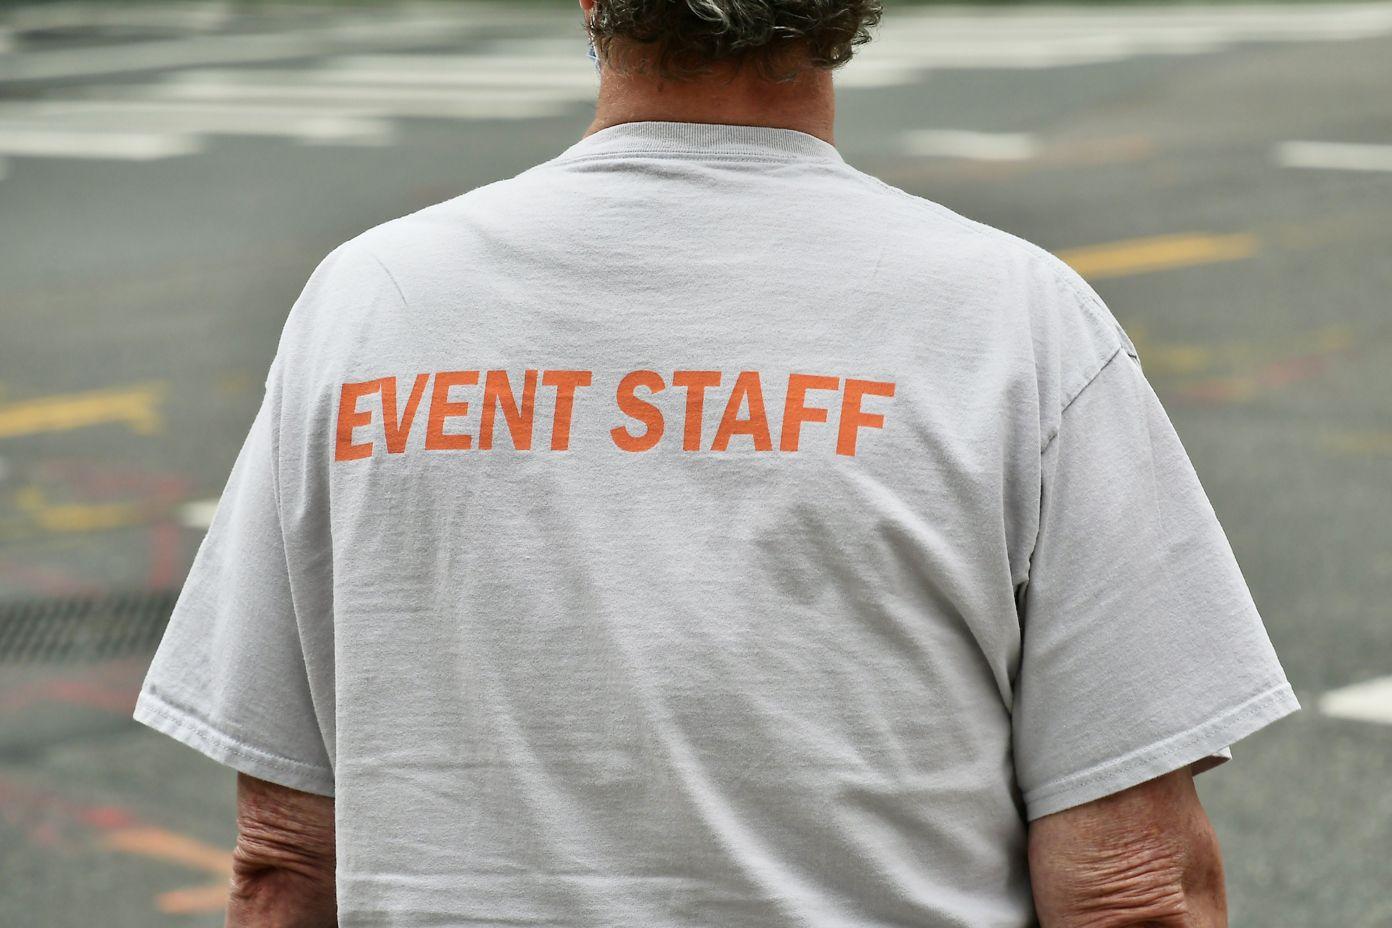 Event Staff Ismail Sirdah